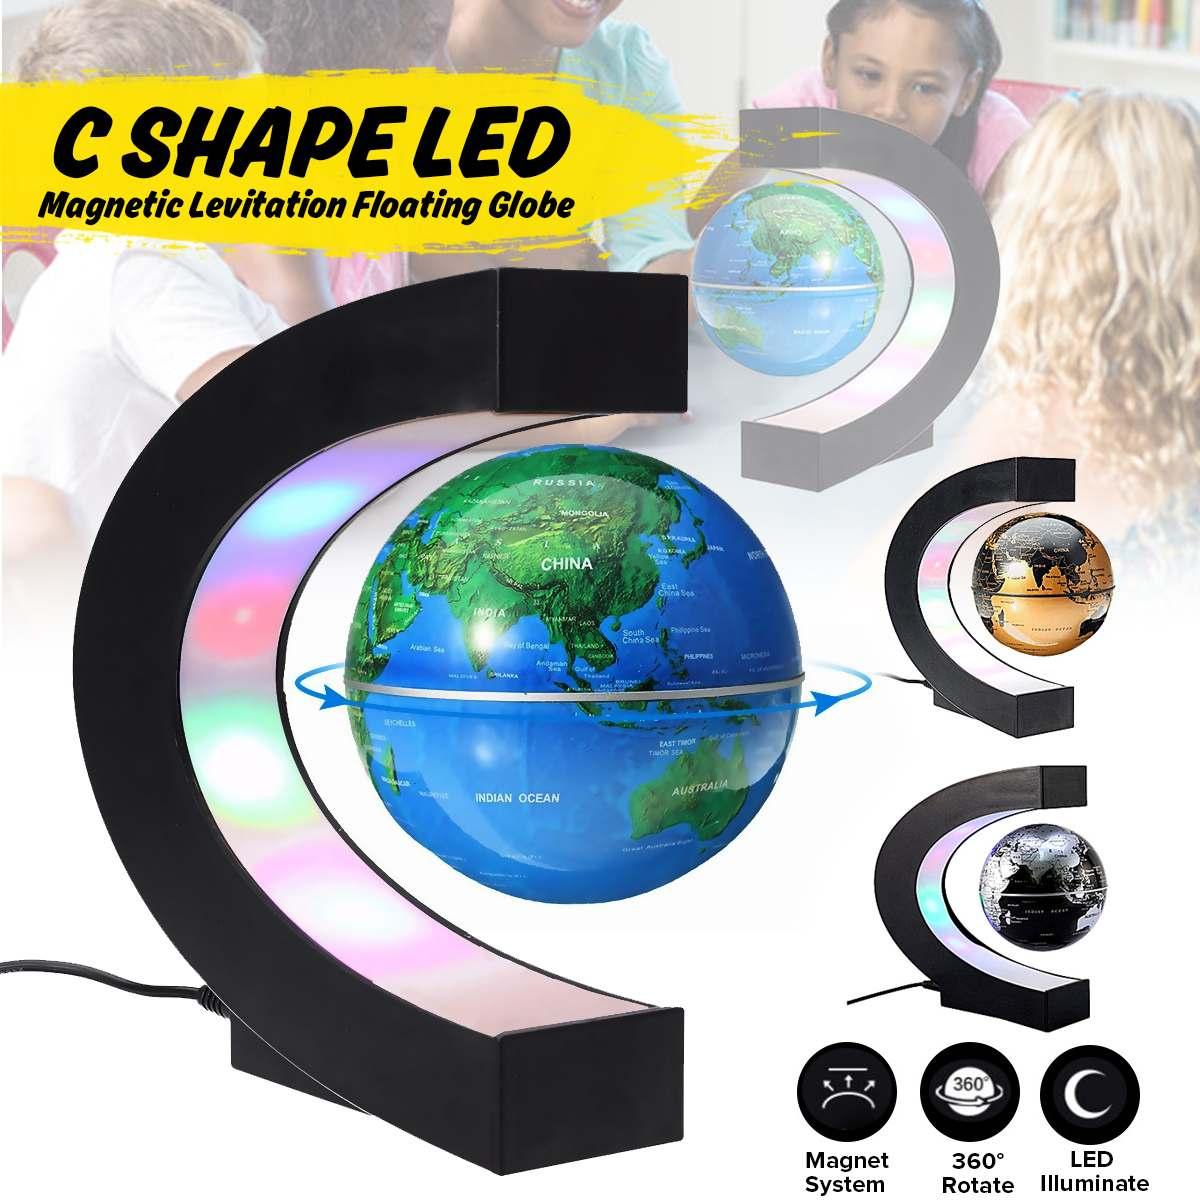 led Magnetic Levitation Globe Night Light Floating World Map Ball Lamp Cool Lighting Office Home Decor Terrestrial Globe lamp|  - title=